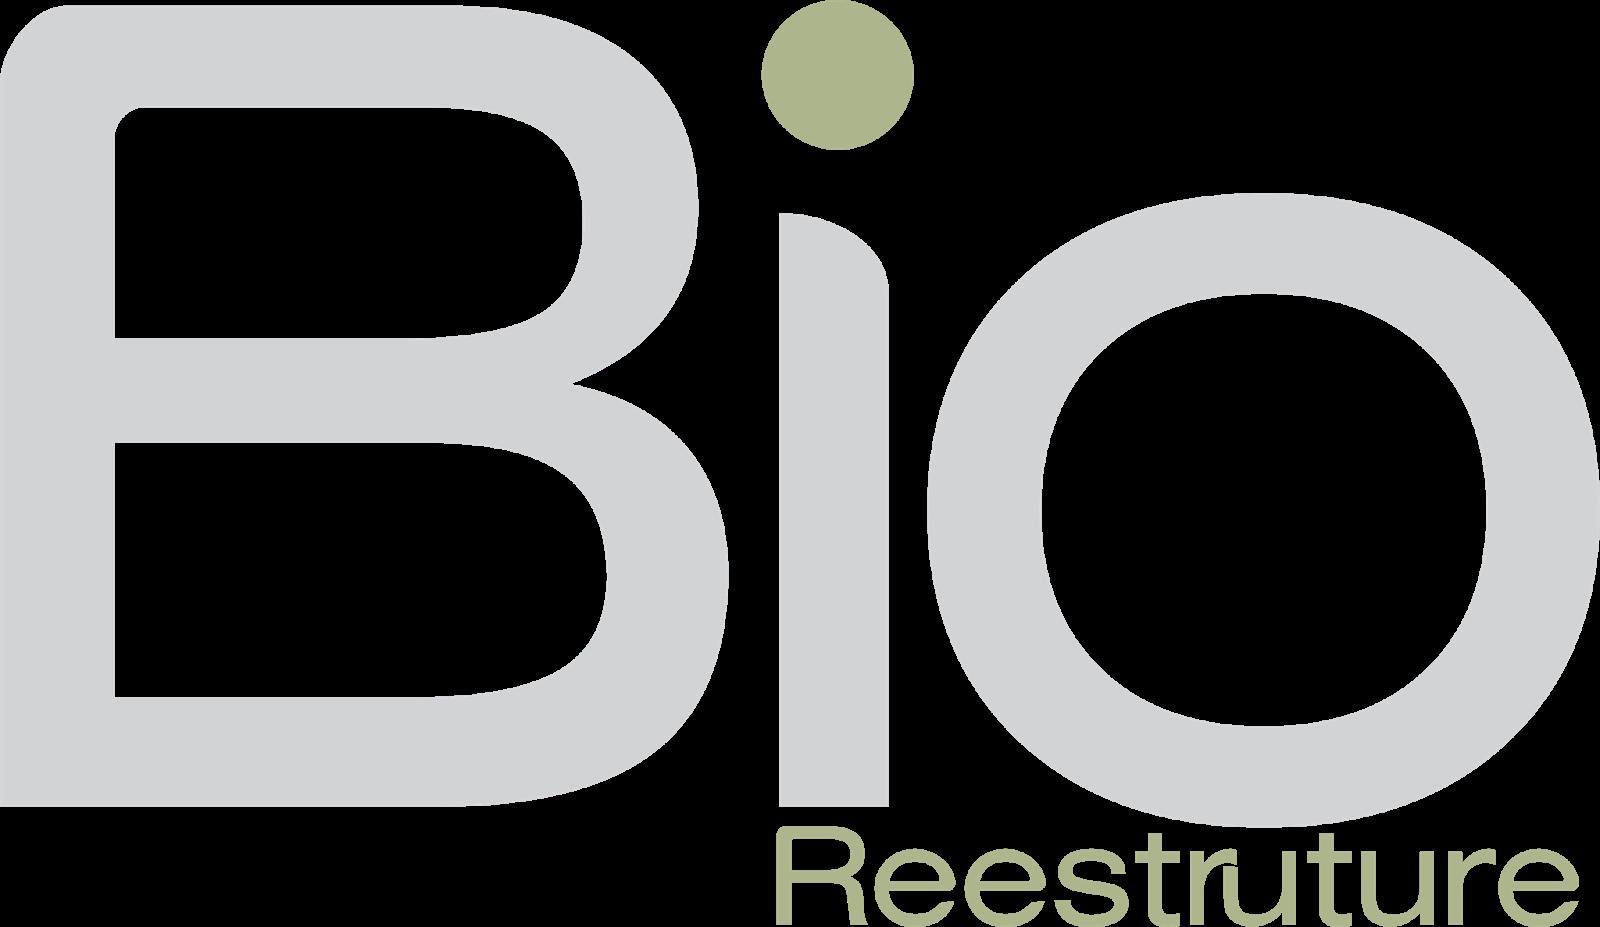 Bio-Reestruture Néctar